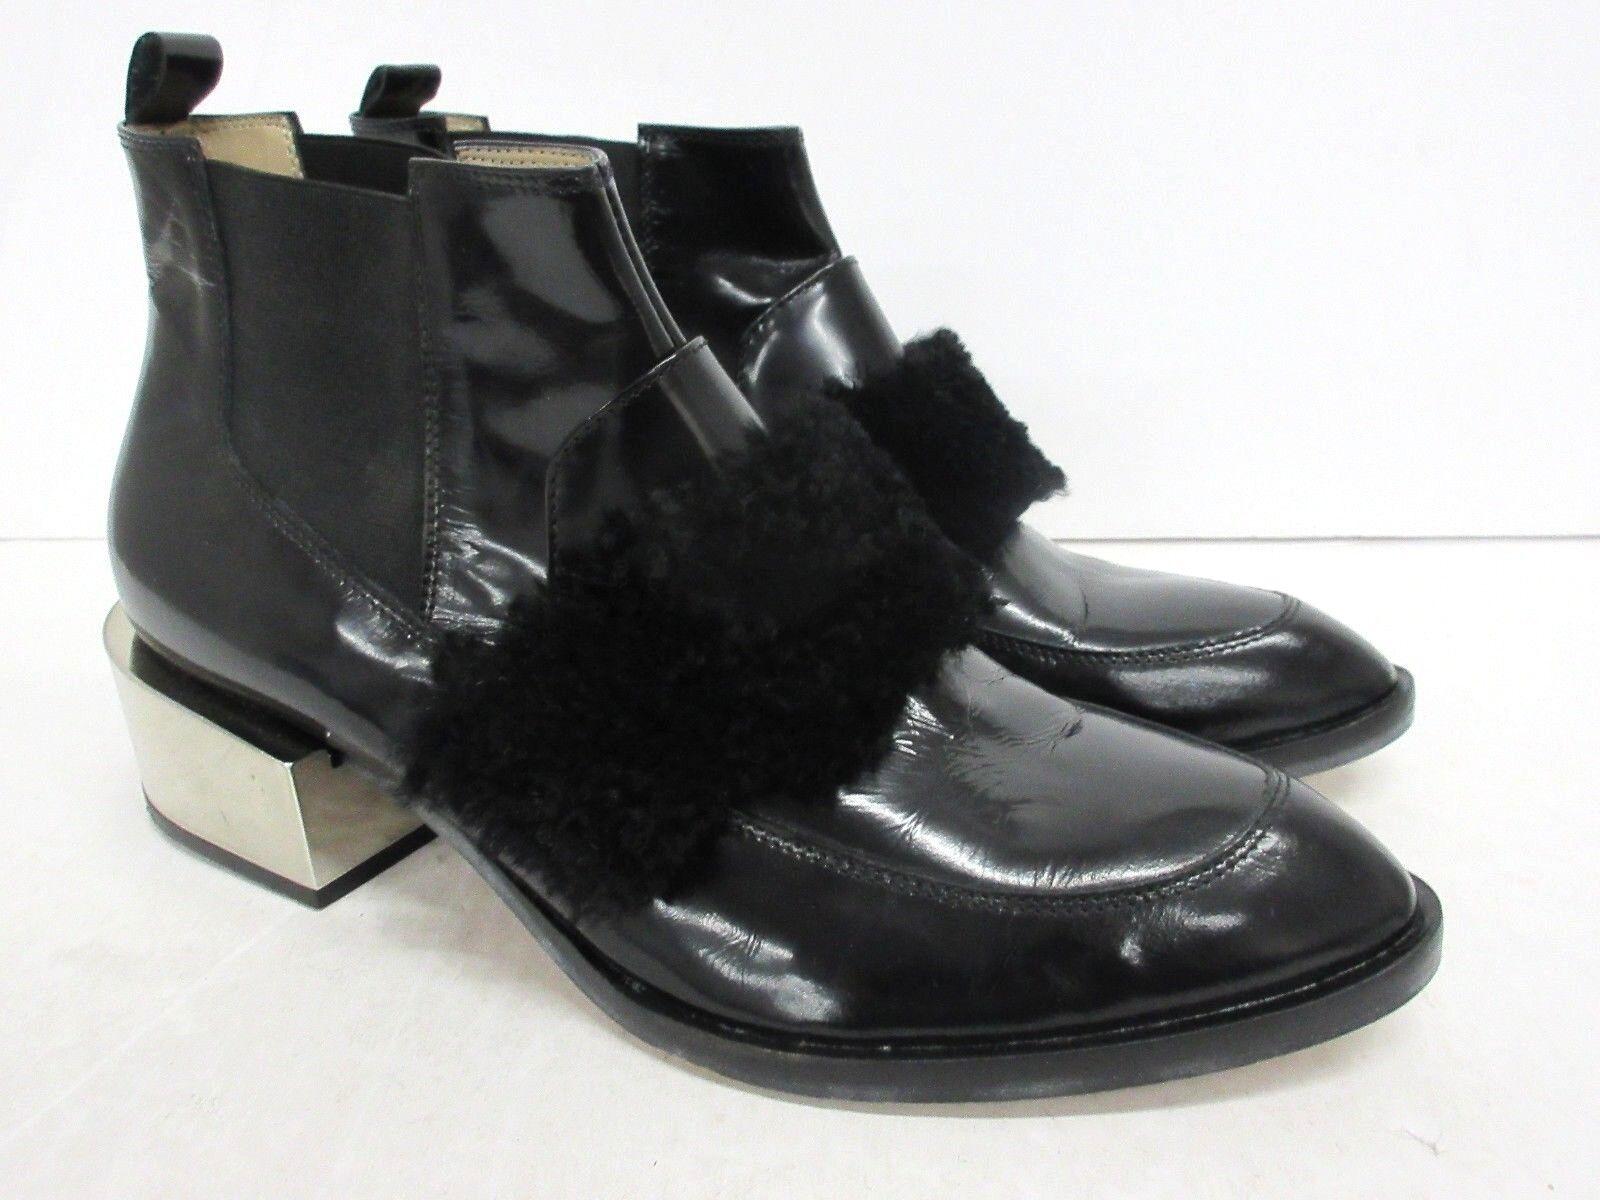 BCBGMAXAZRIA Faux Fur Patent Leder Leder Leder Ankle Boot Größe: 40 EUR 6822fb